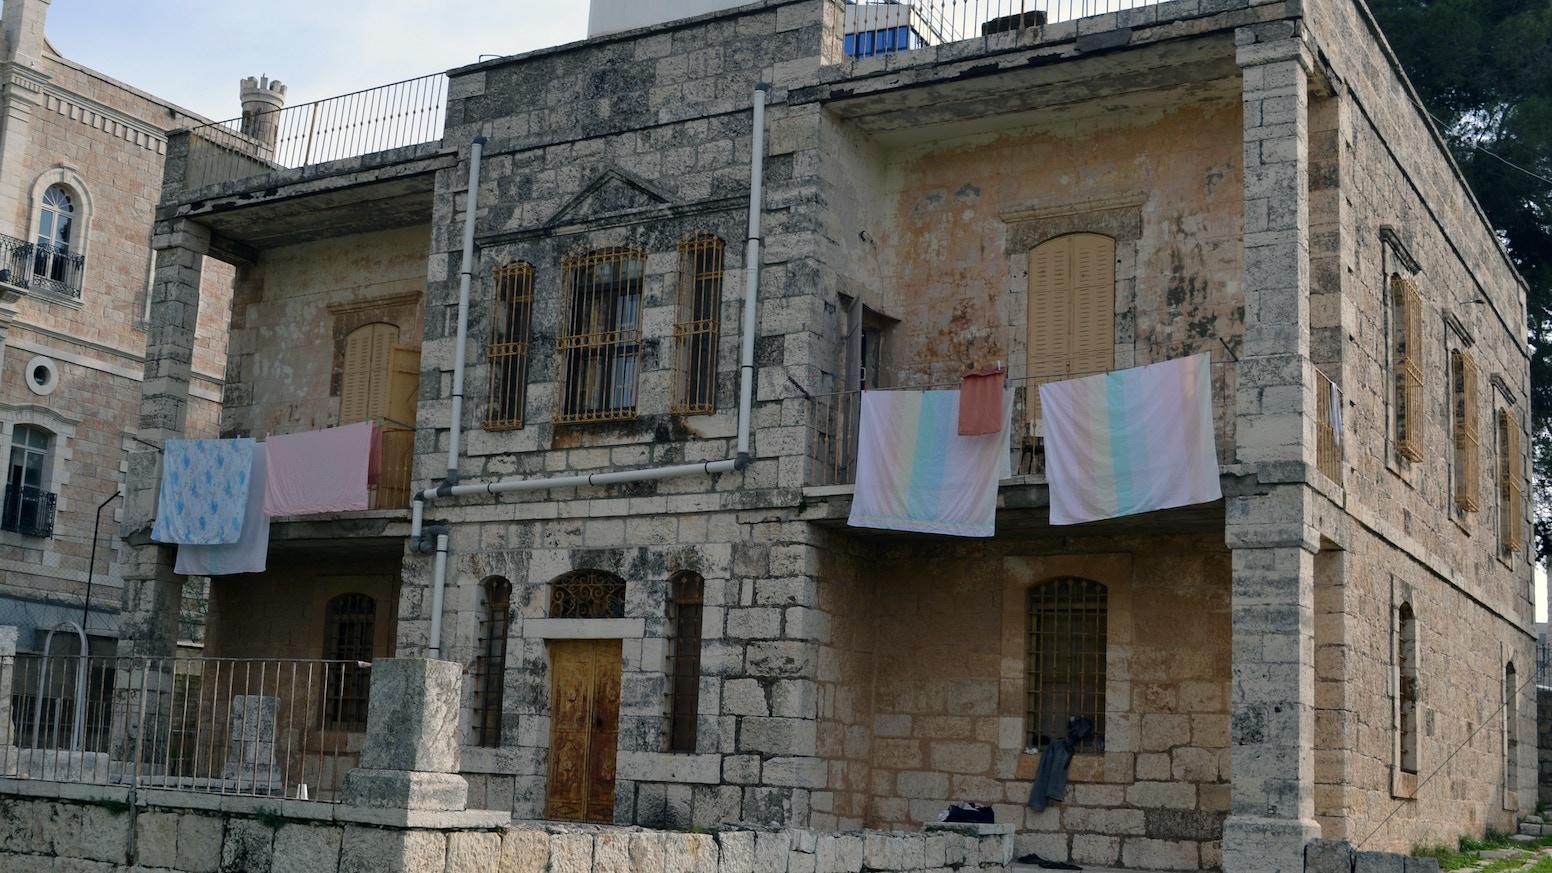 Dar jacir by emily jacir kickstarter for Architecture maison traditionnelle libanaise